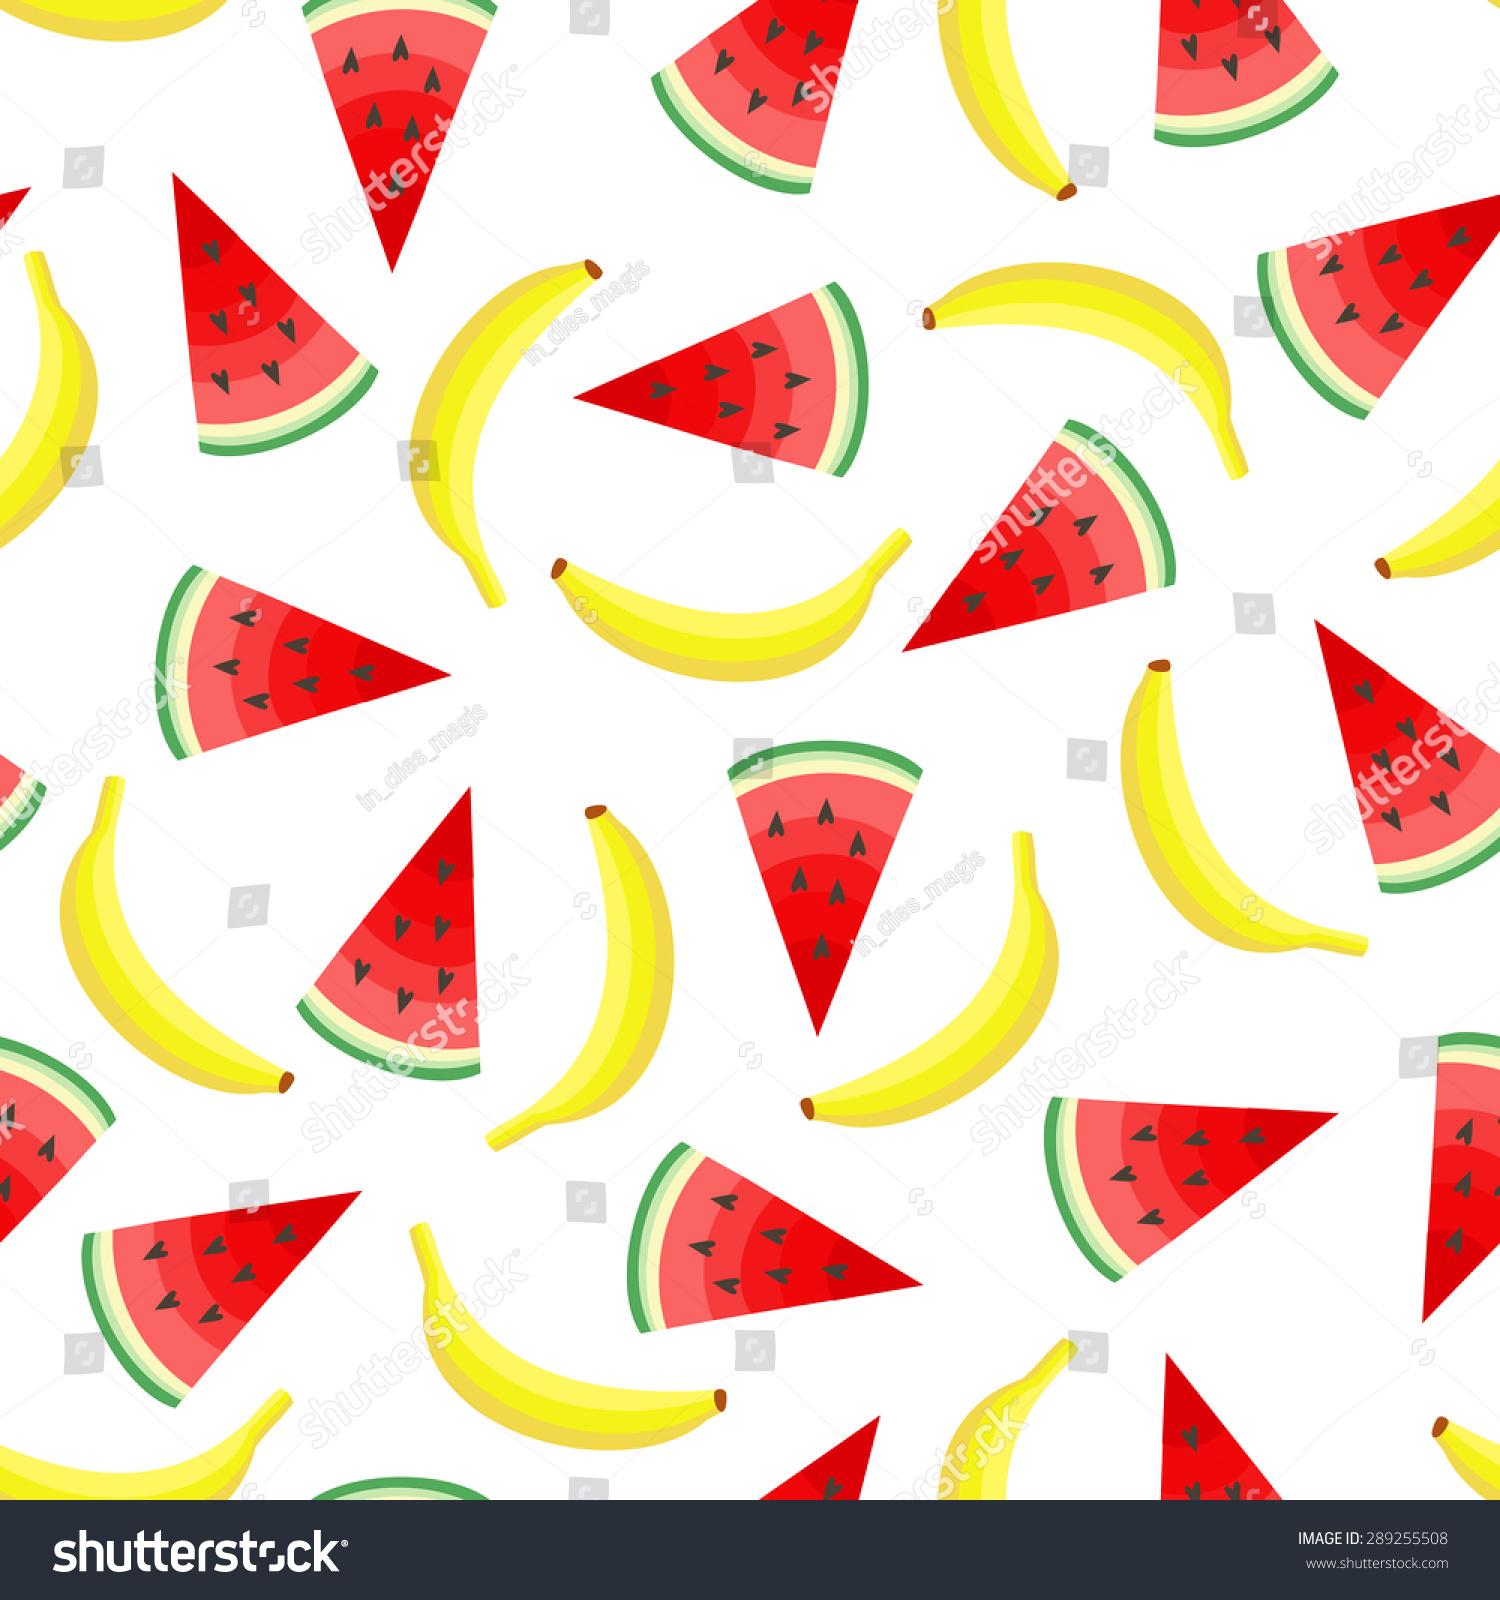 Download Wallpaper 1600x1200 Watermelon, Yellow, Water 1600x1200 ...